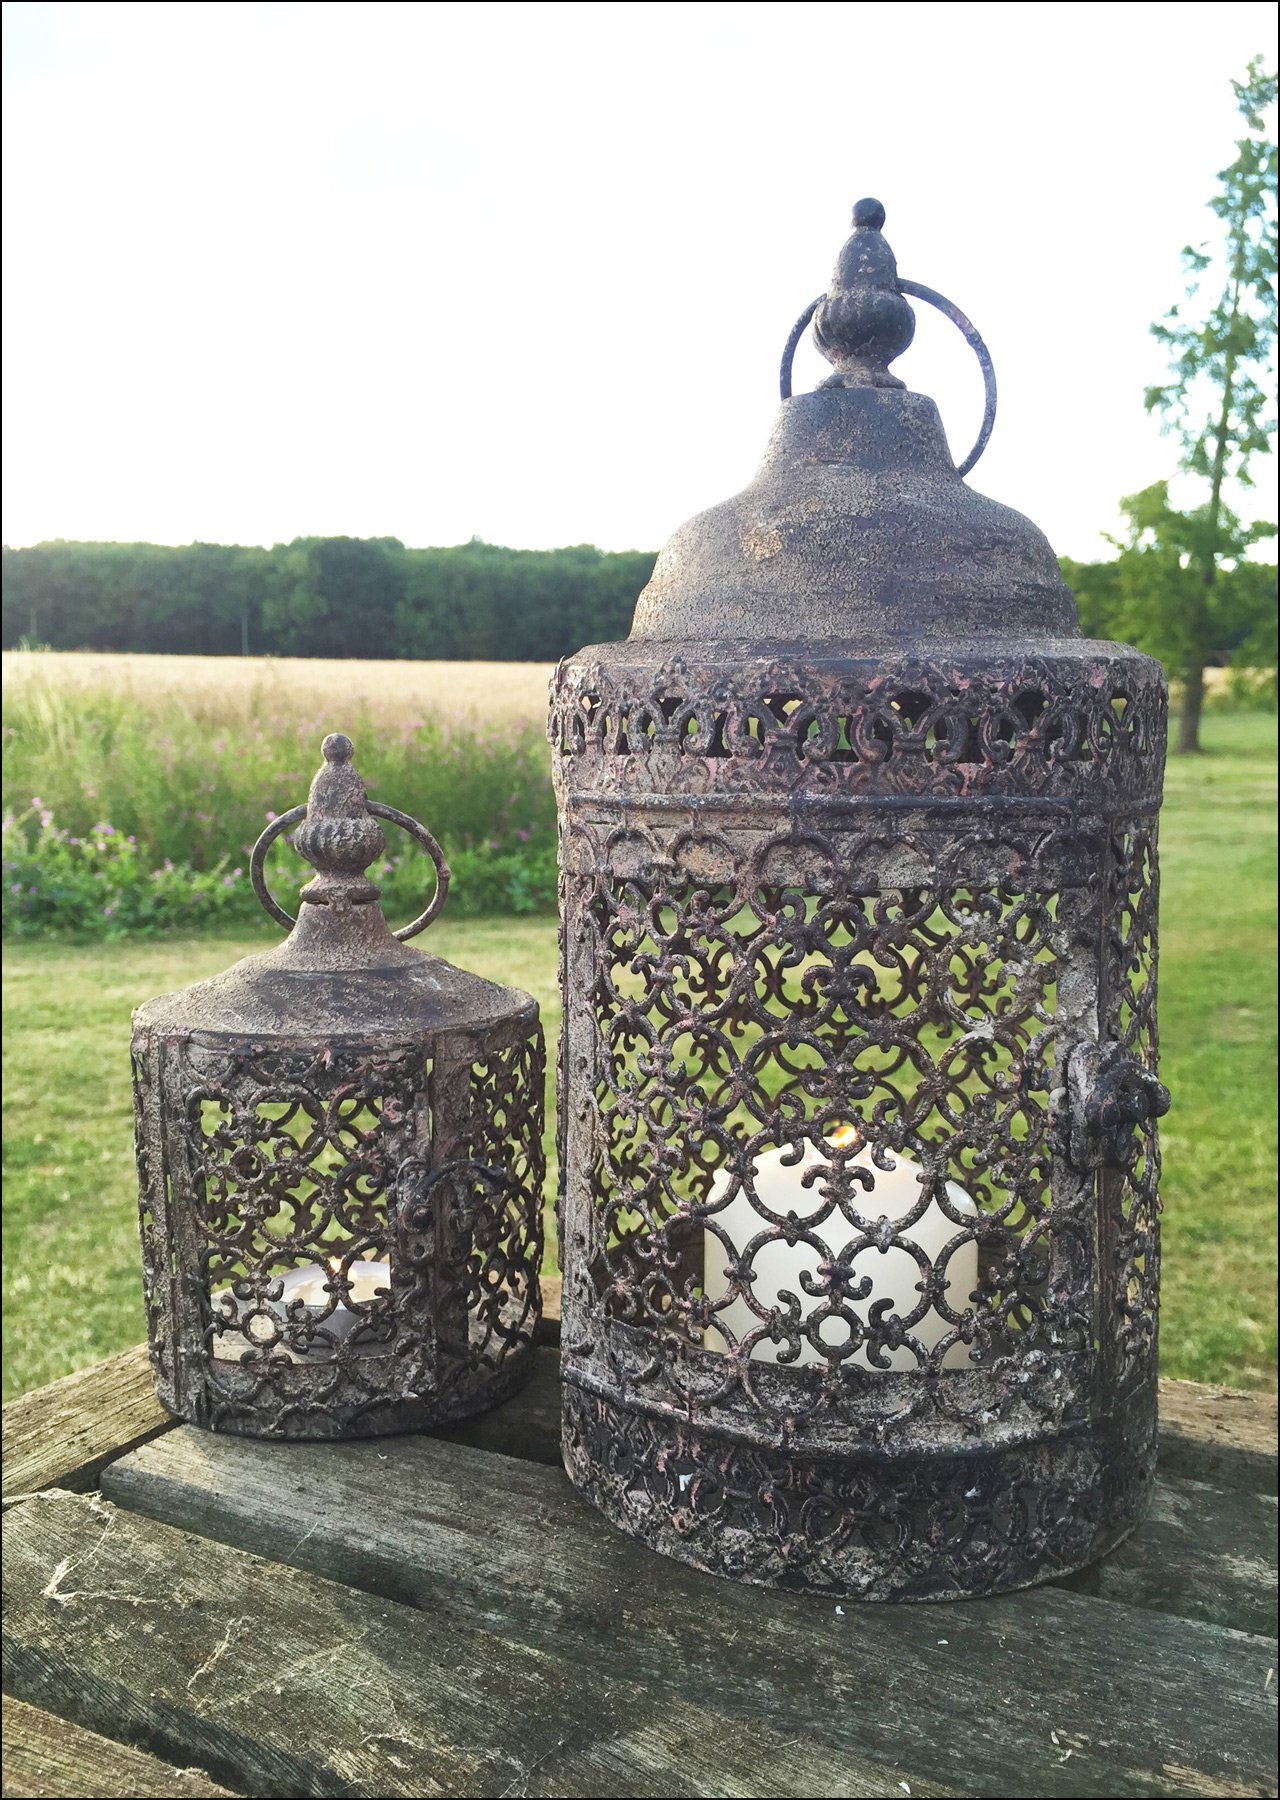 Vintage Moorish Lantern Candle Holder, Set of Two Moroccan Garden Indoor or Outdoor Use, Rustic